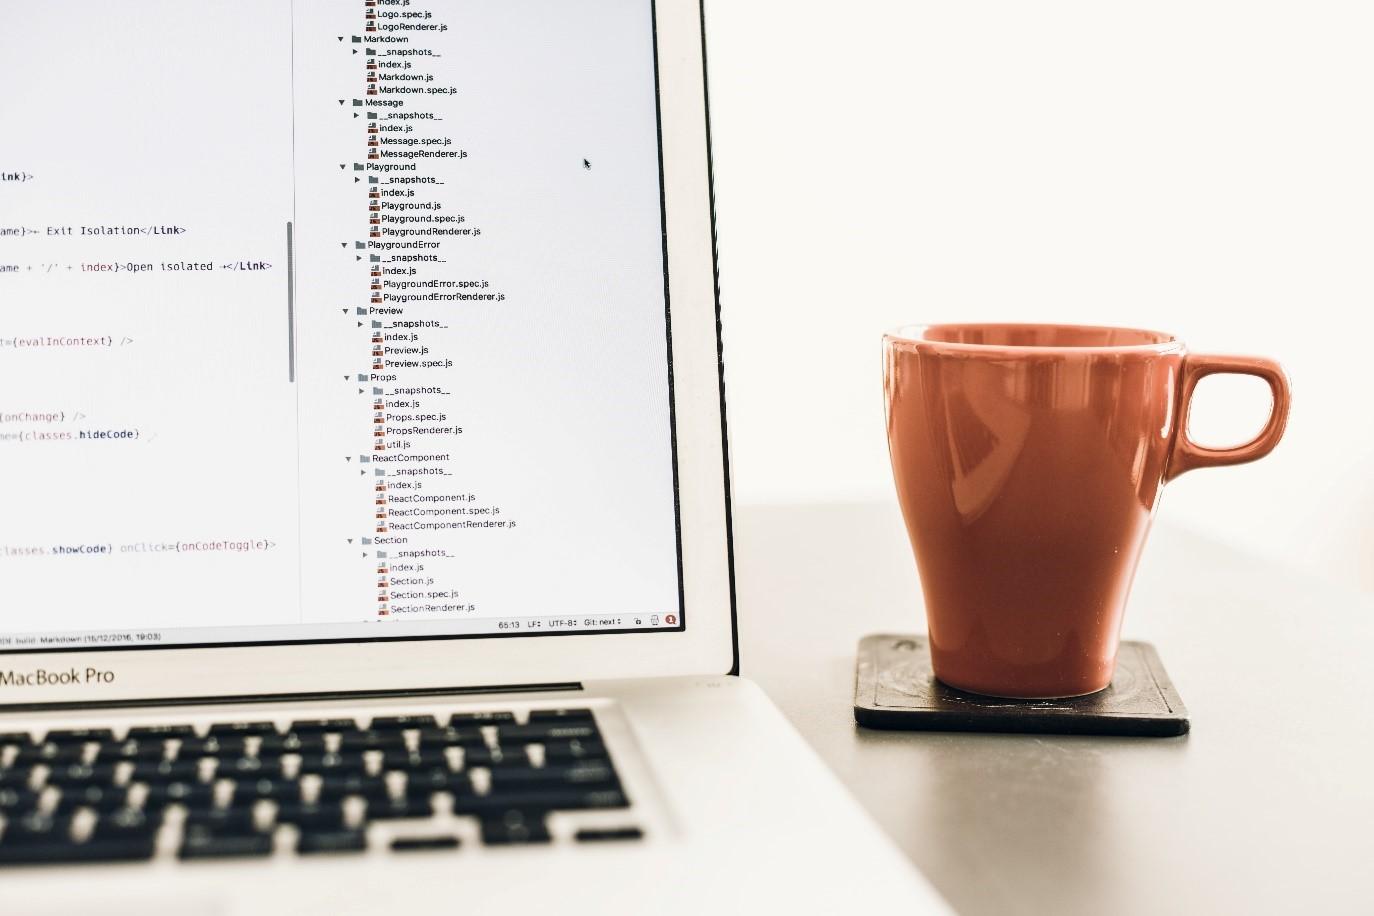 A laptop and a mug.